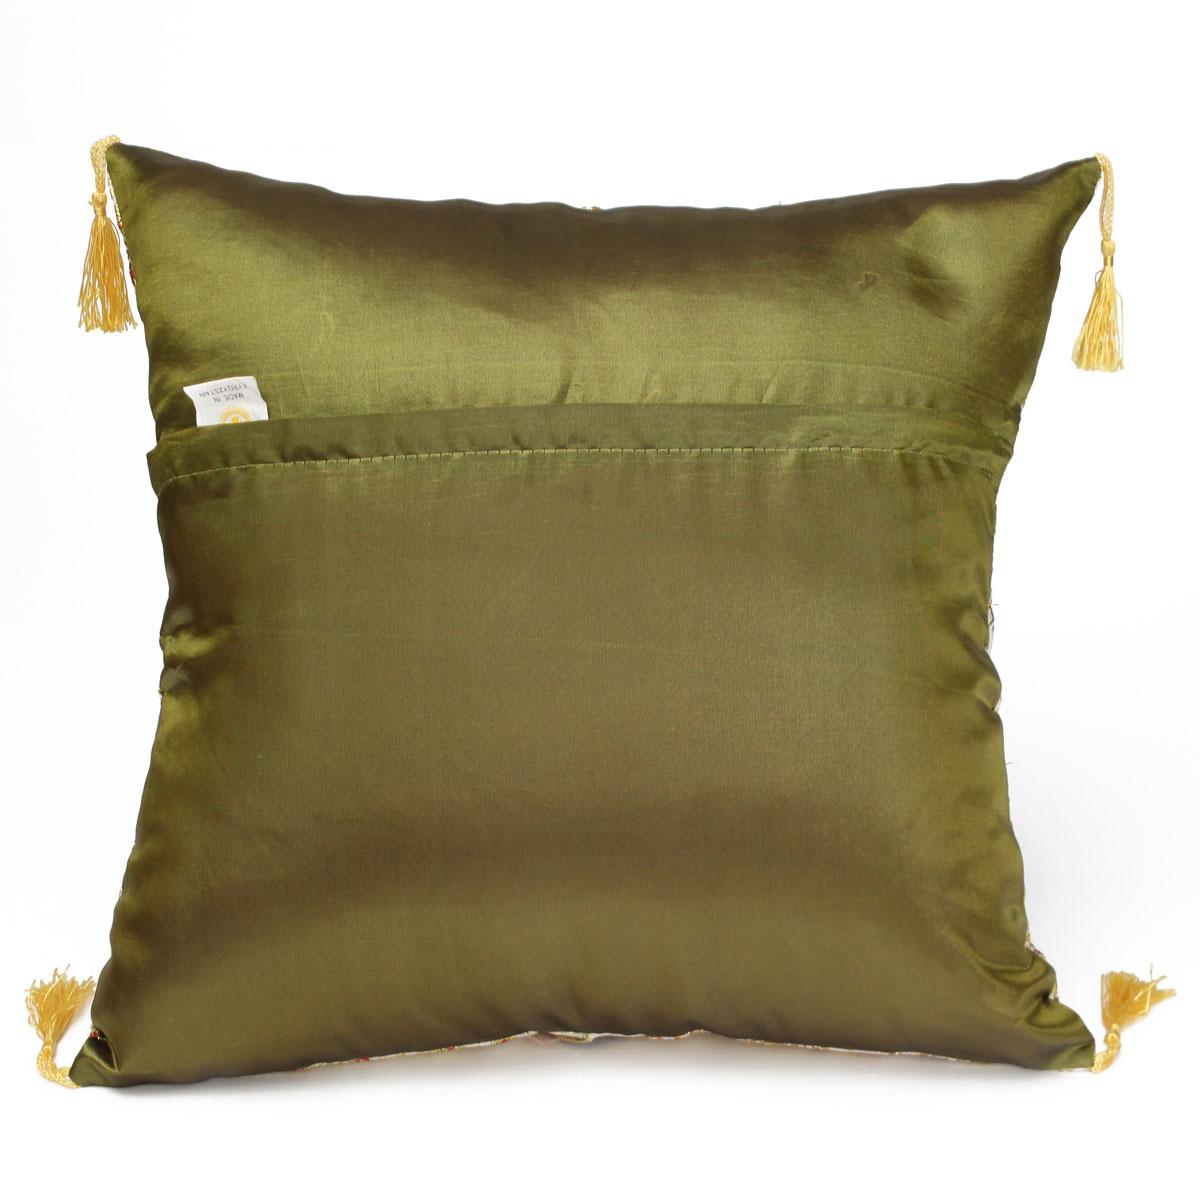 Vintage Flower Tassels Cotton Pillow Case Sofa Throw Cushion Cover Home Decor